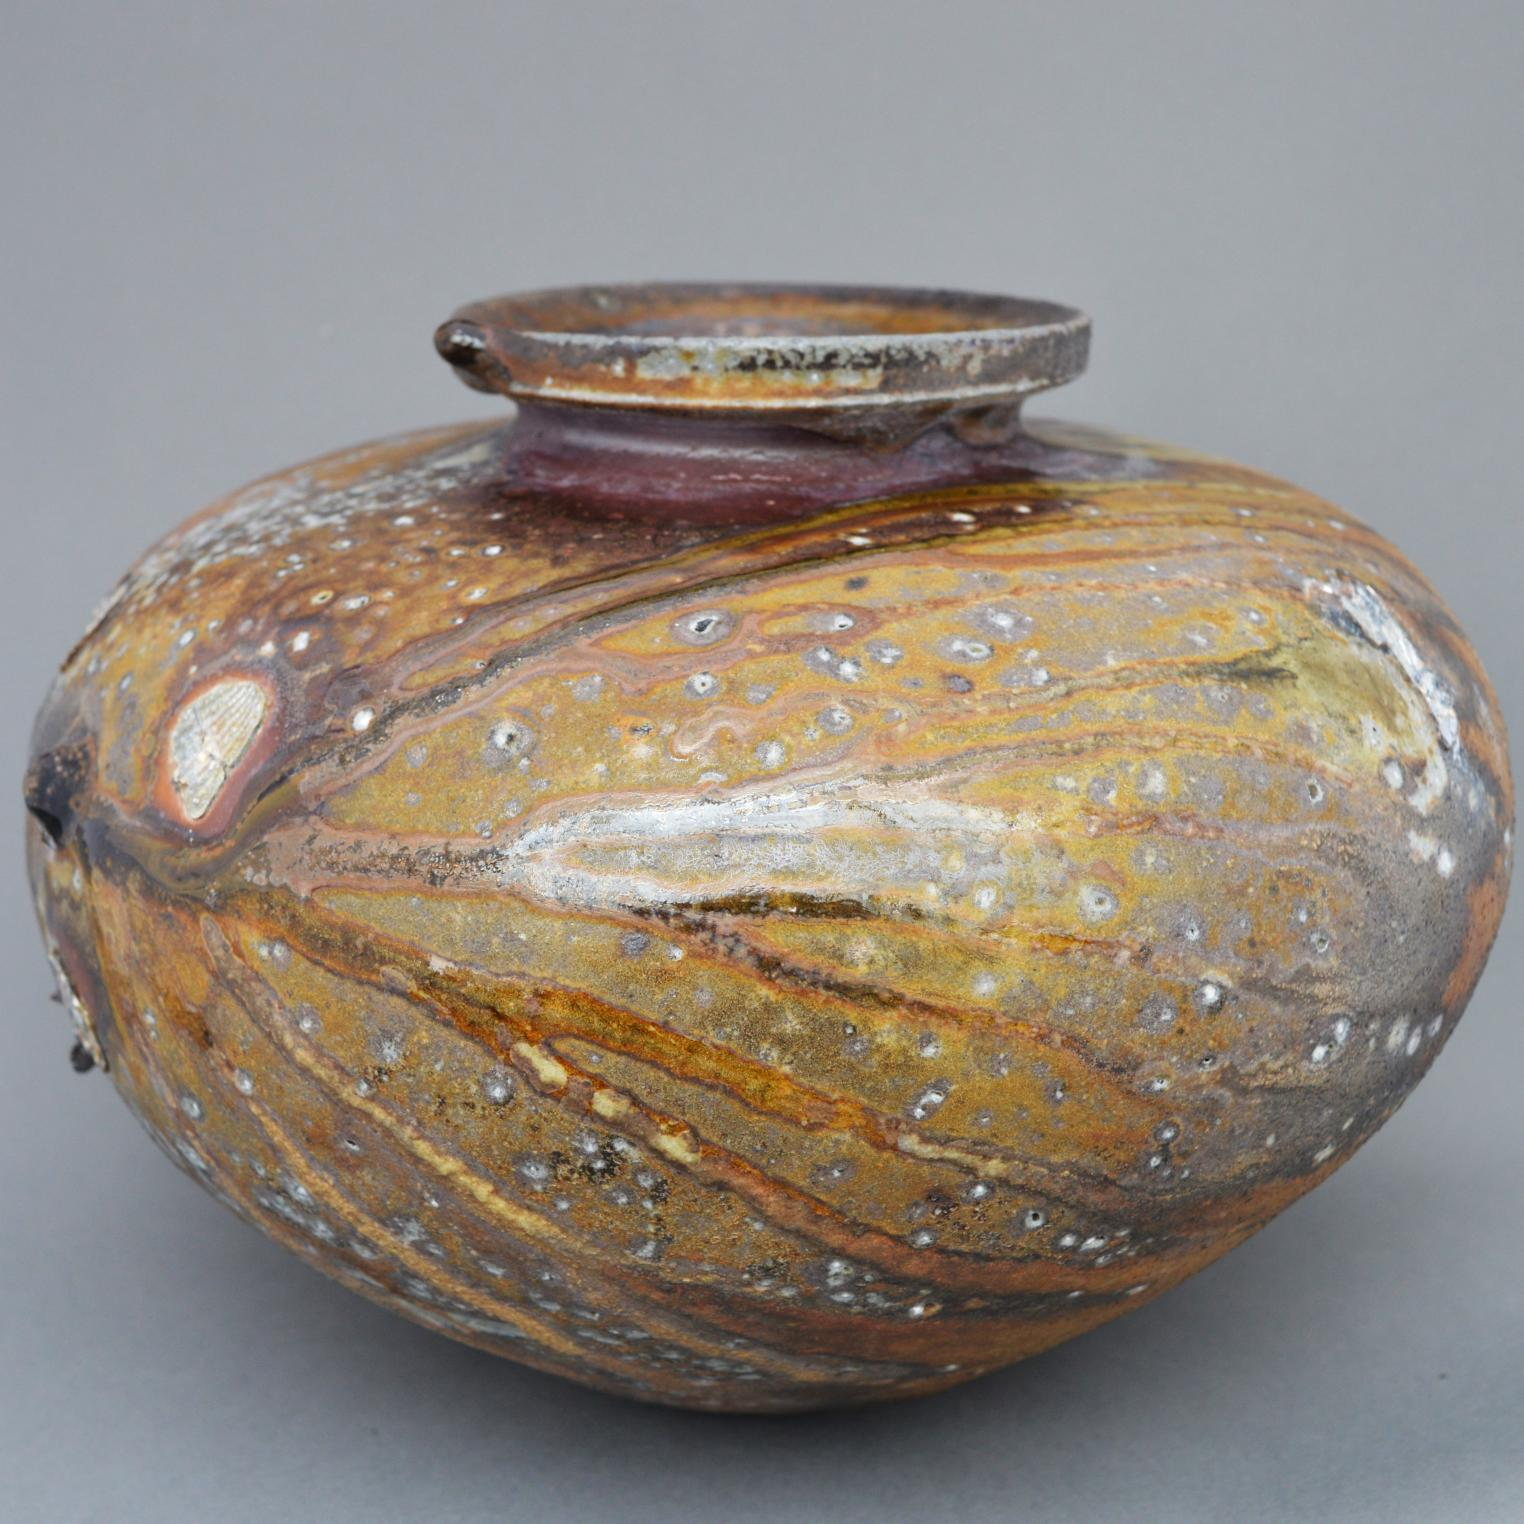 Kurt Brantner Gallery